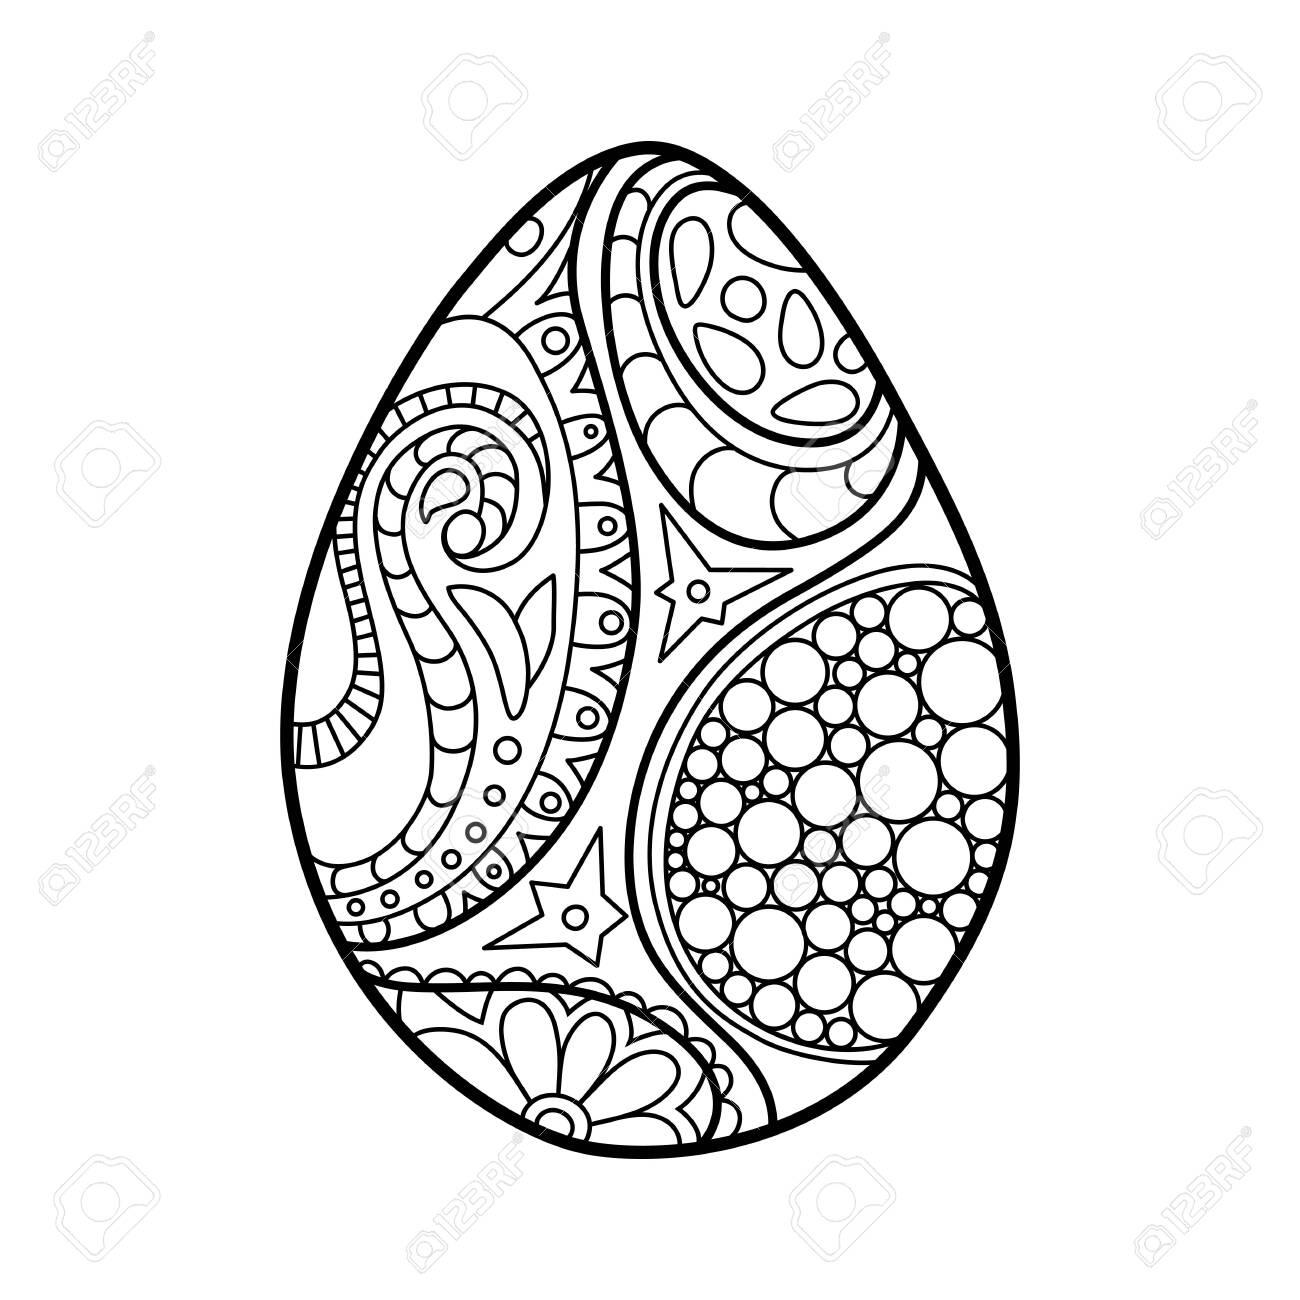 Easter egg coloring page. Ornament egg outlined vector illustration..